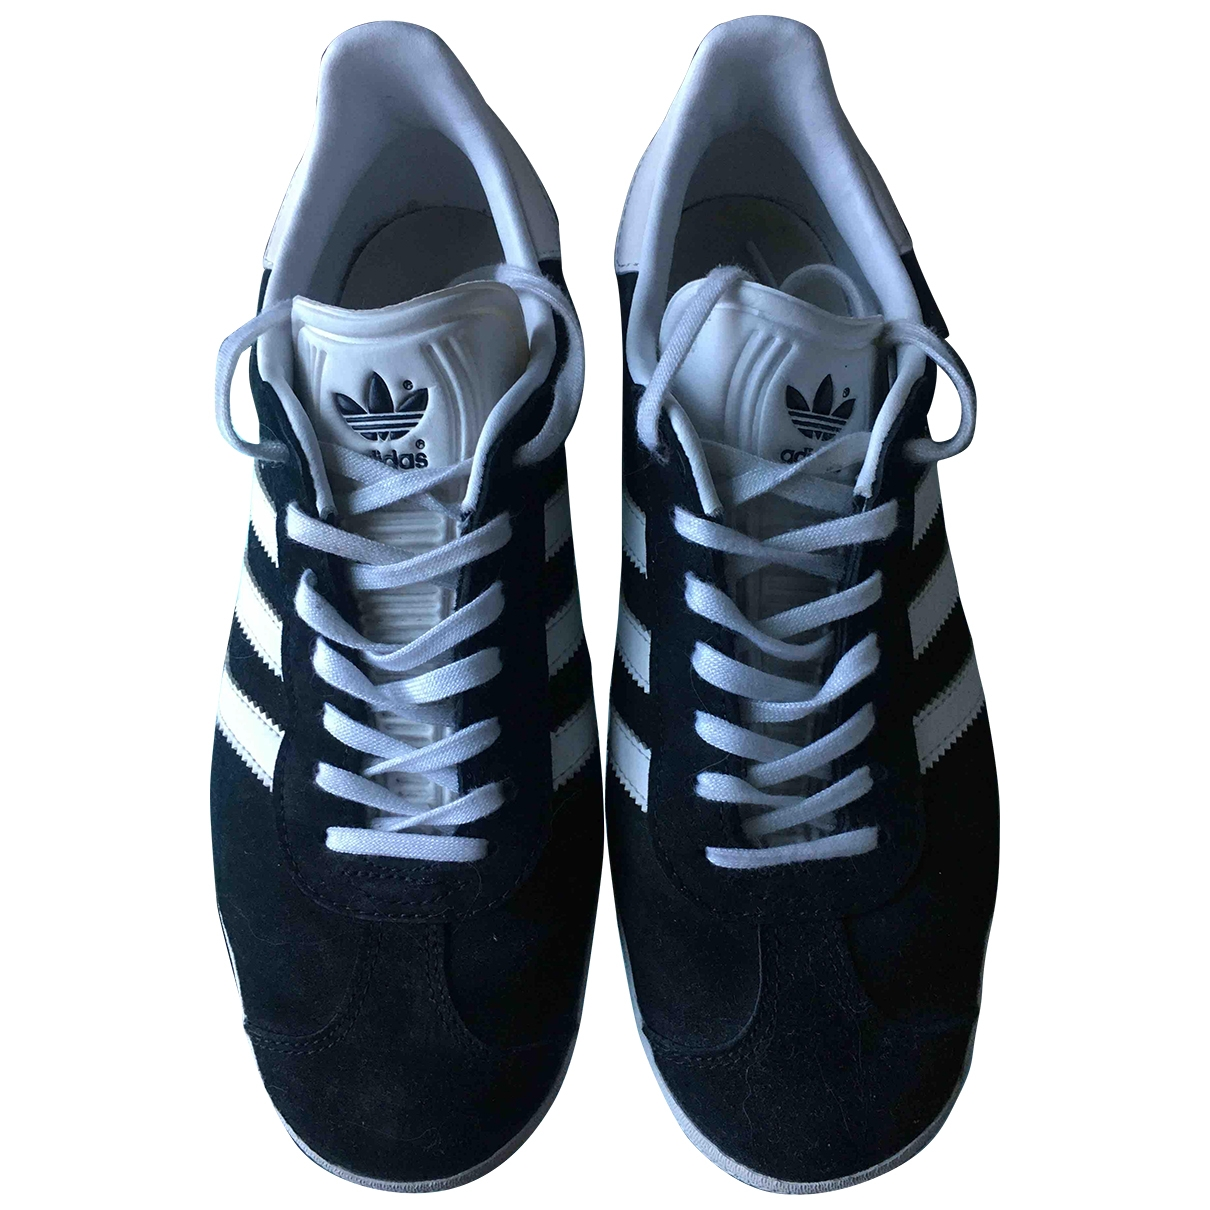 Adidas Gazelle Black Suede Trainers for Women 38.5 EU